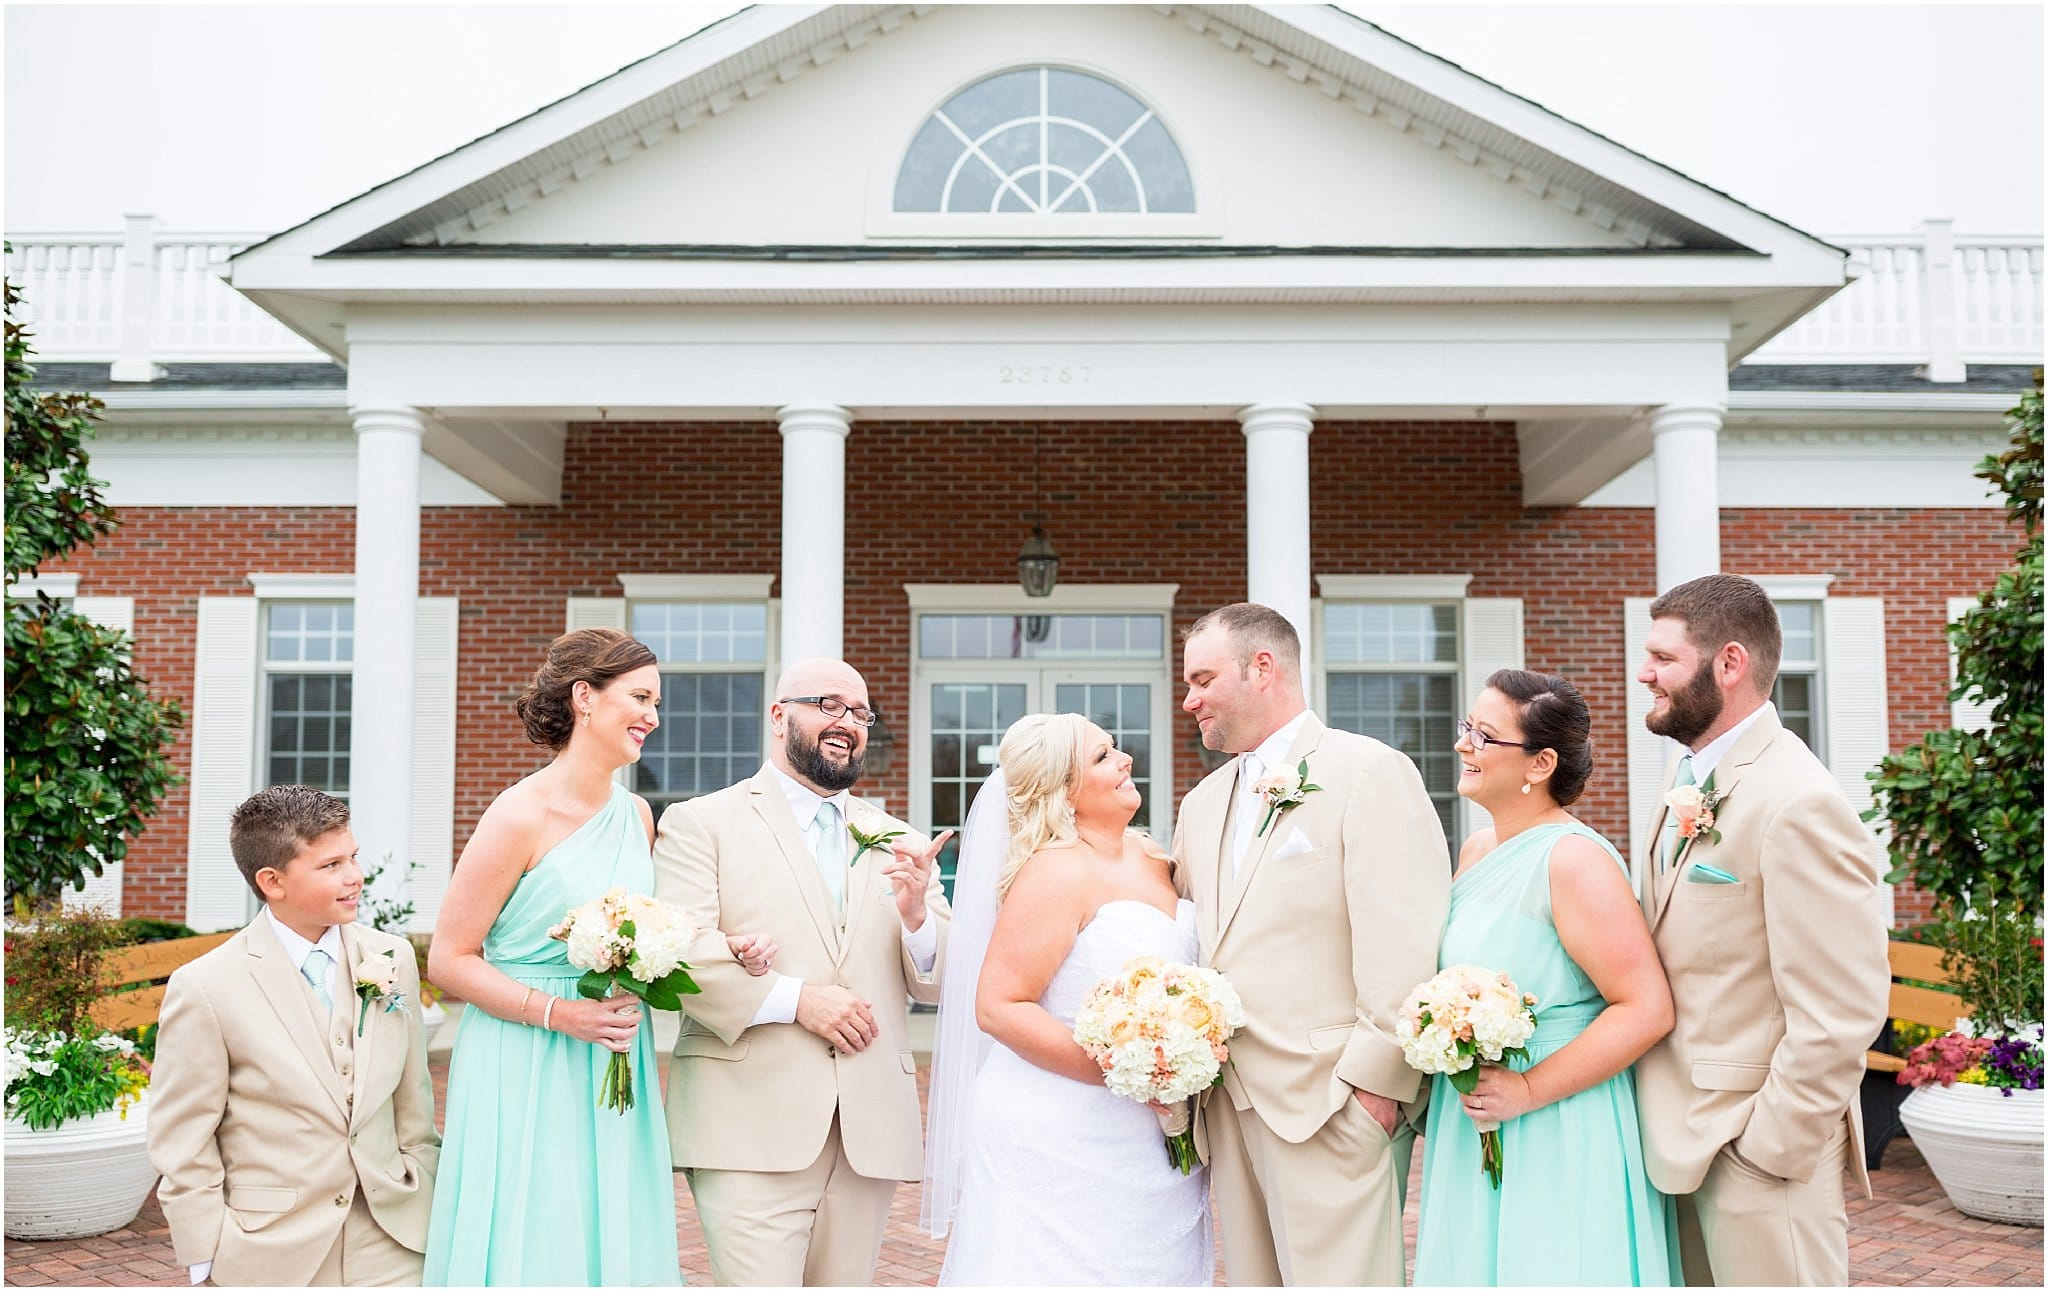 jessscott-milsboro-delaware-wedding-cassidymrphotography_0053